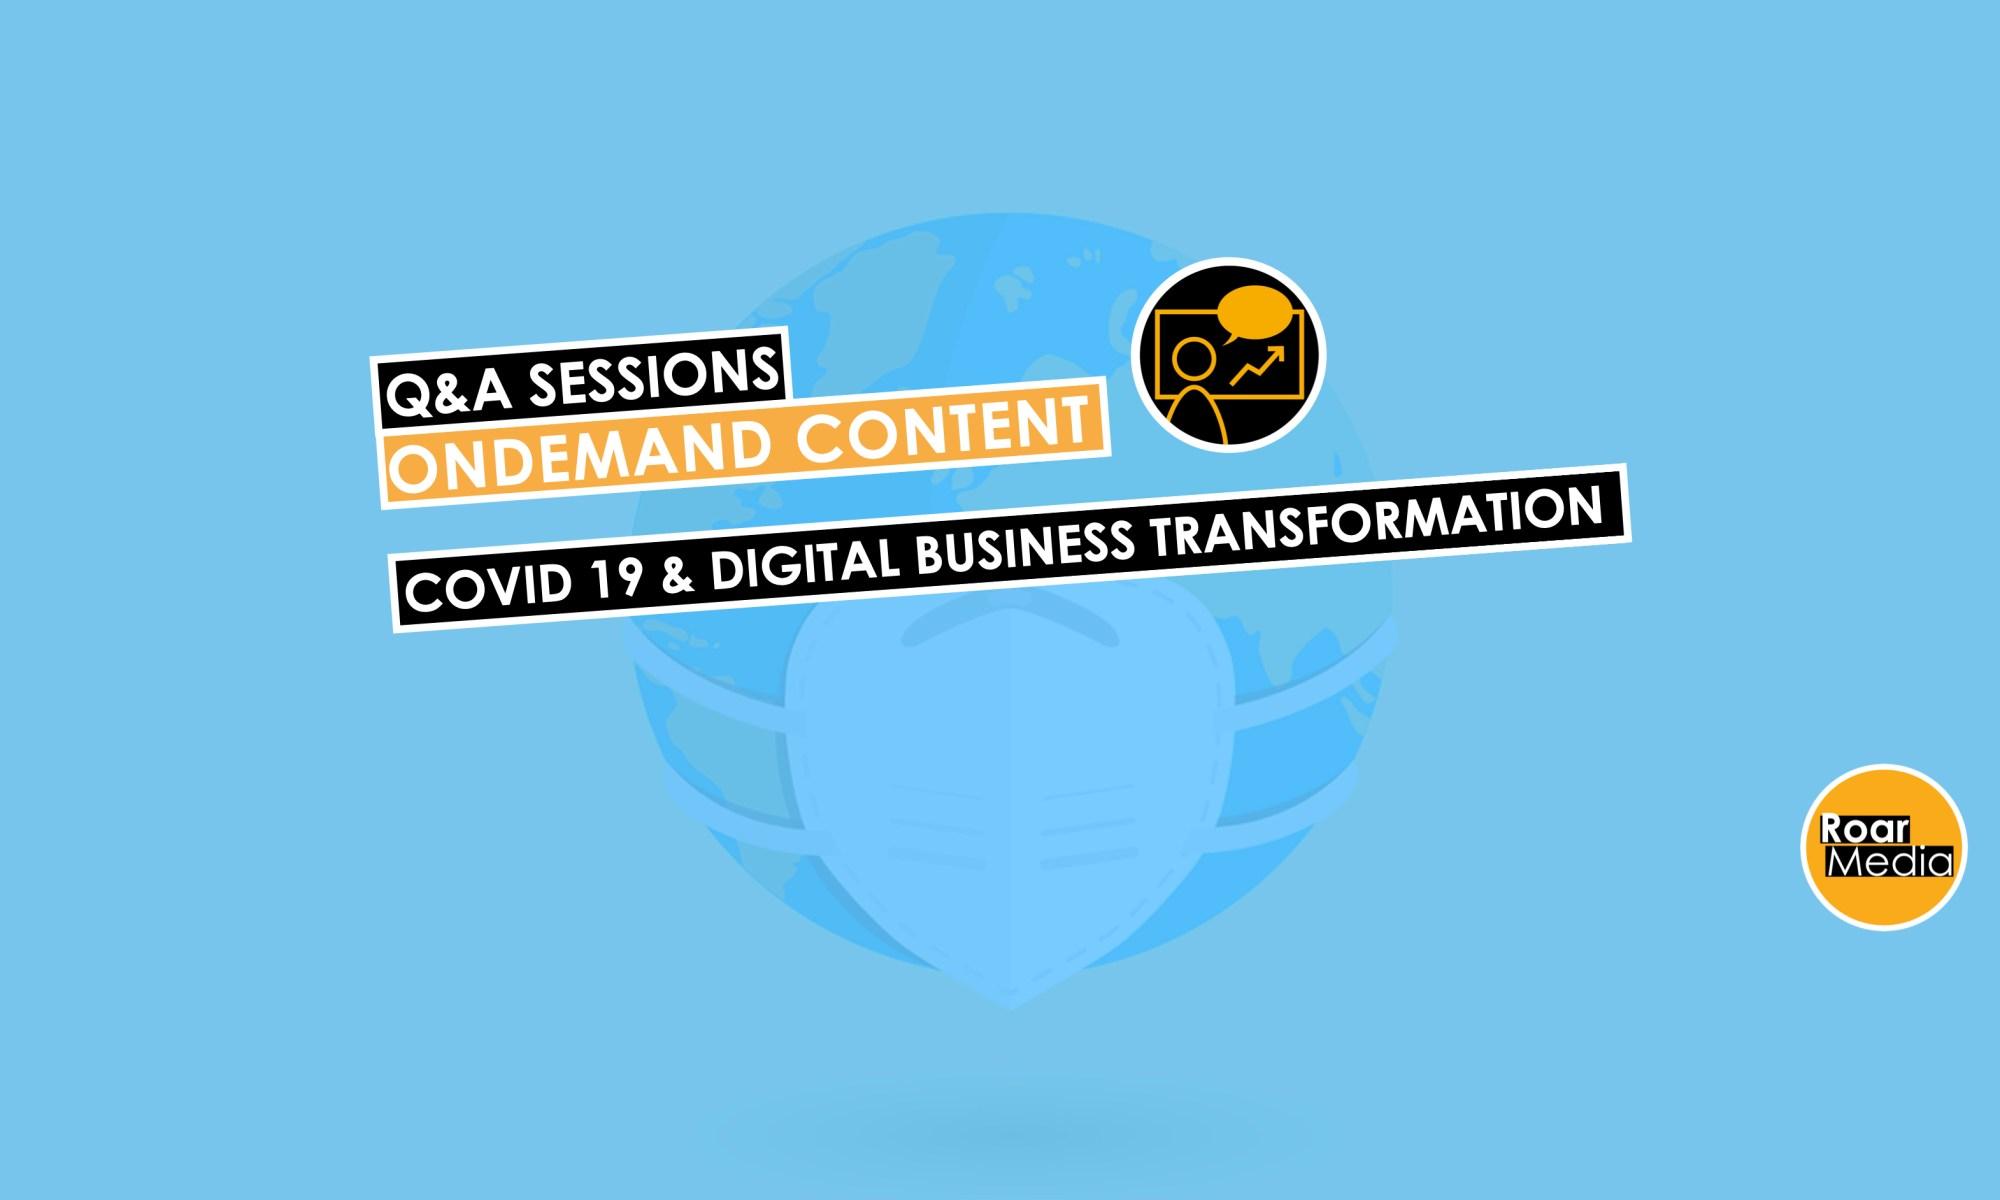 Covid 19 Impact on Digital Business Transformation